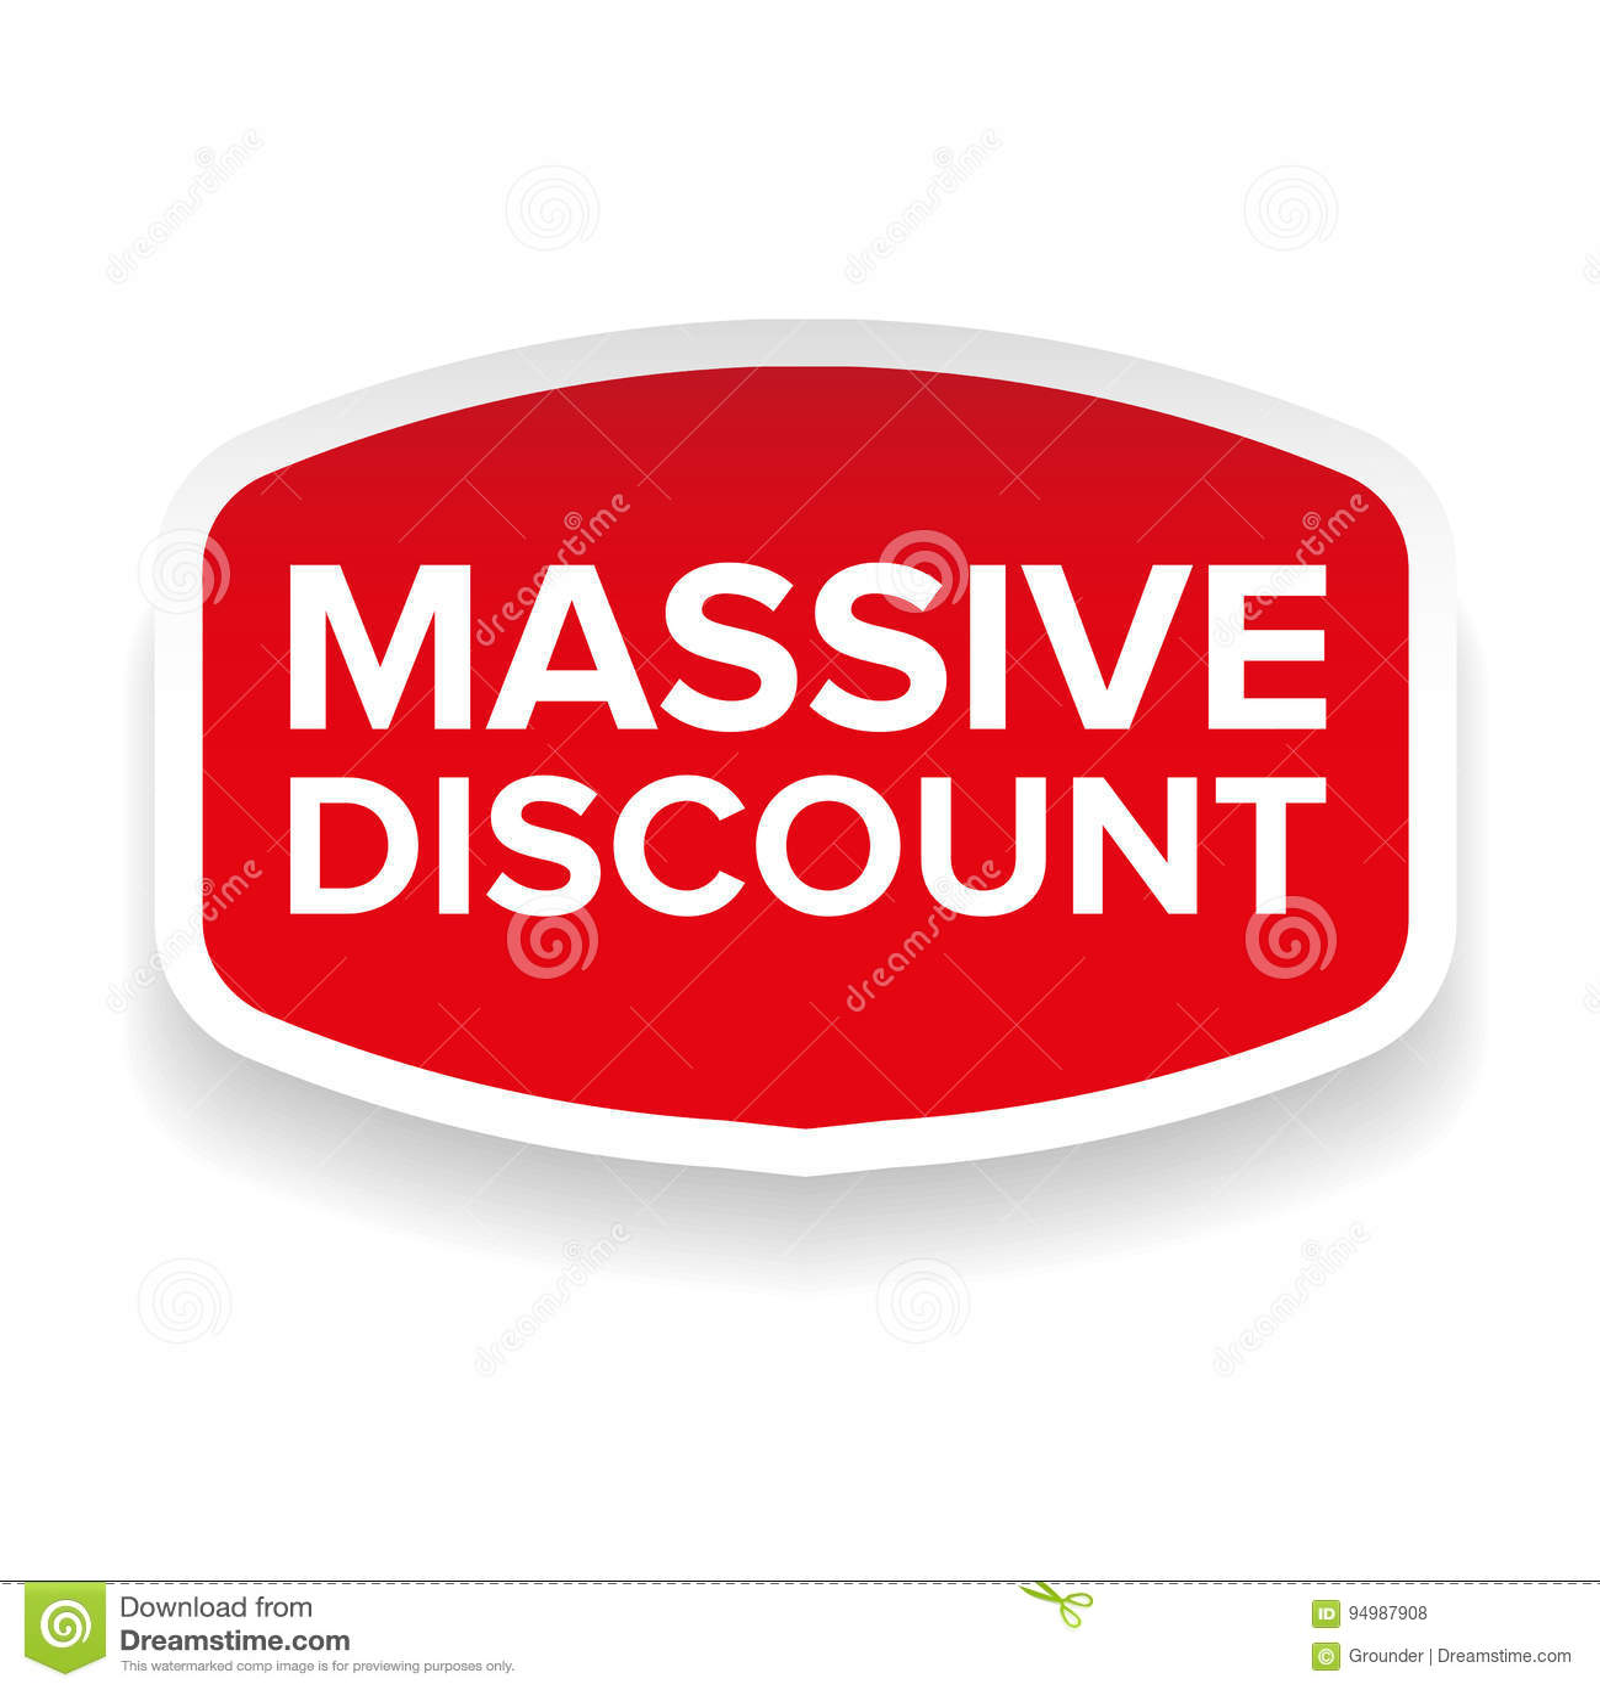 Massive Discount Sticker Stock Vector Illustration Of Season 94987908